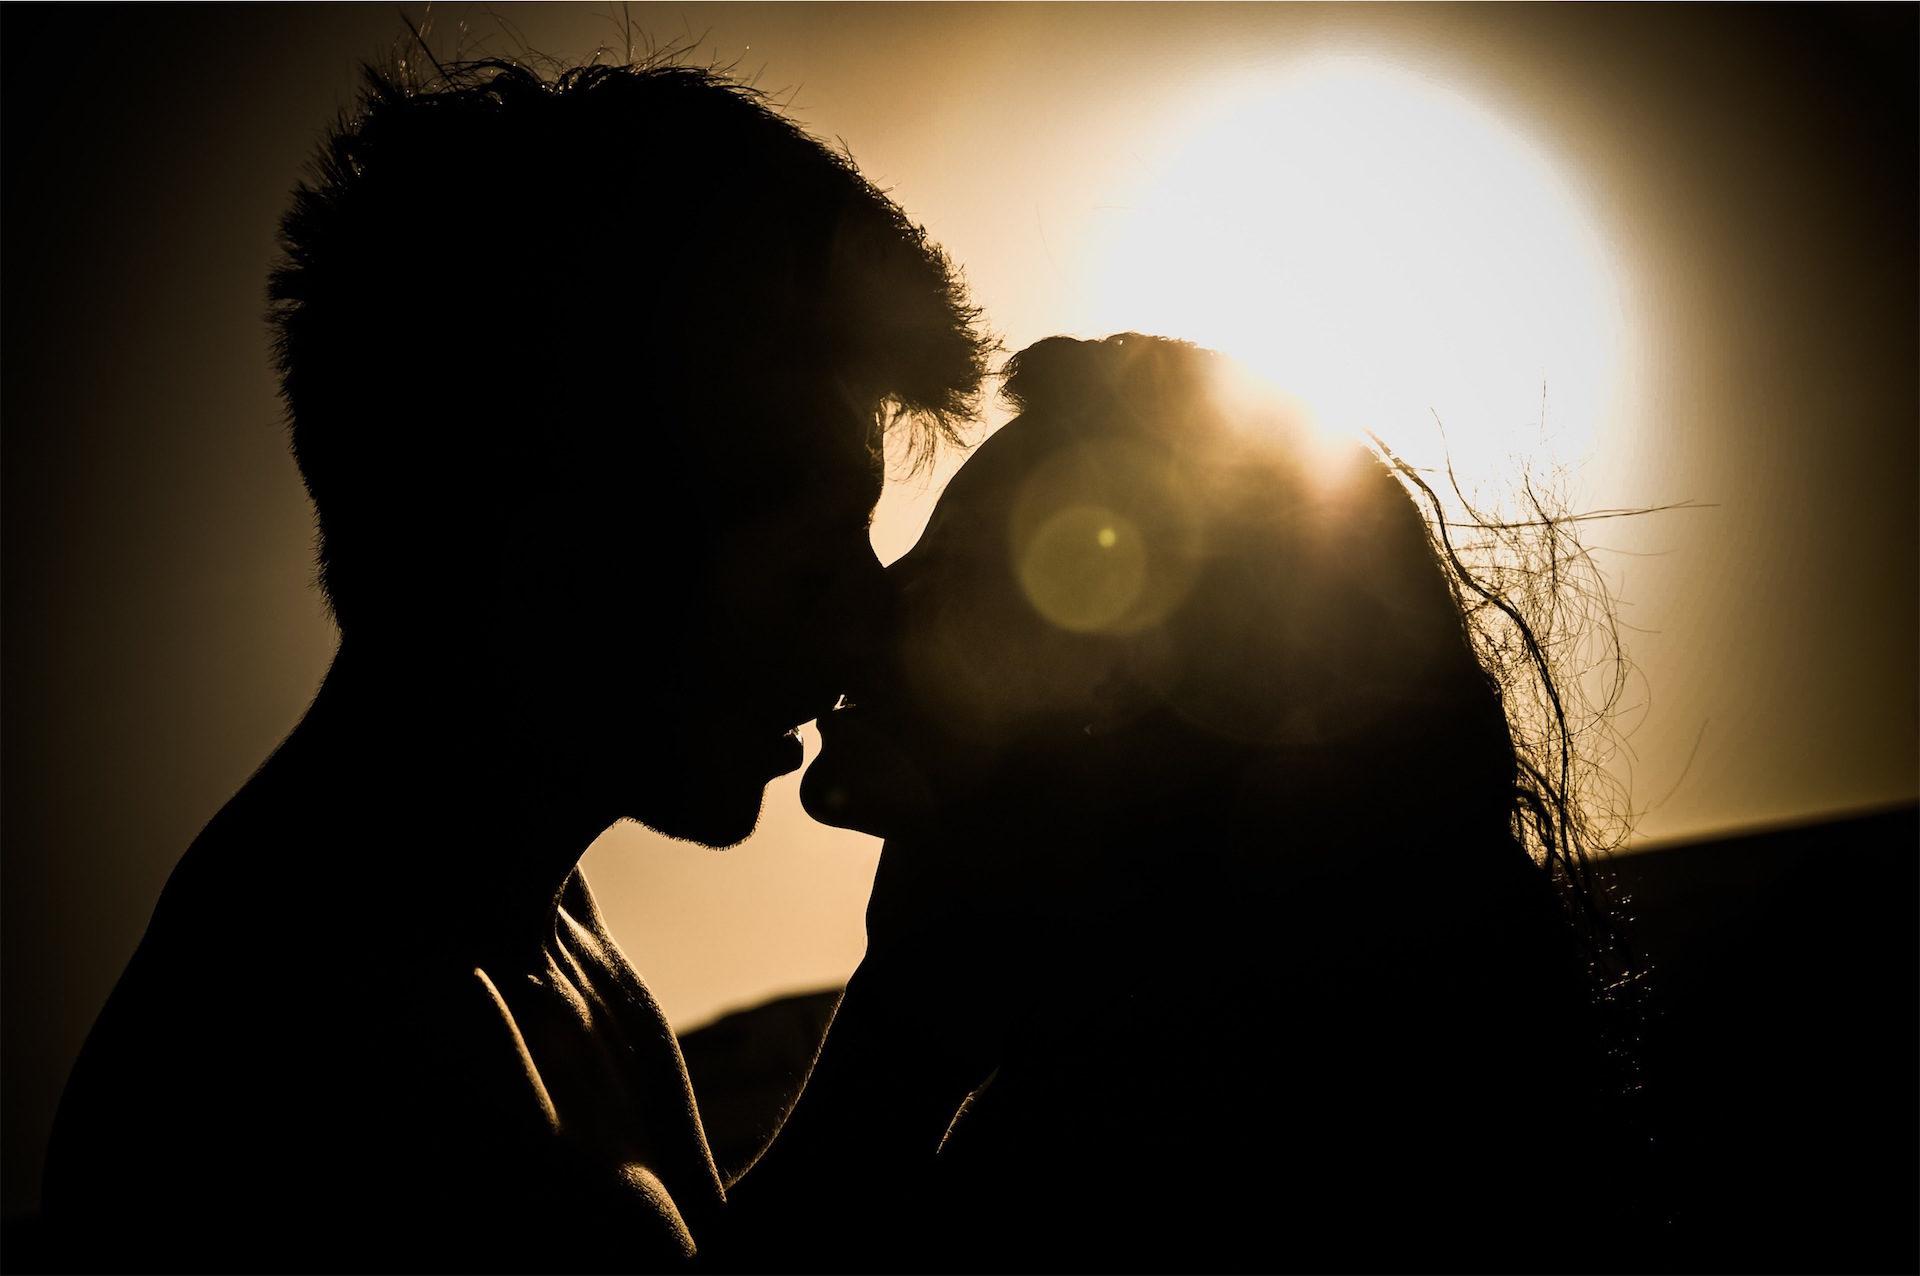 pareja, sombras, amor, pasión, sol - Fondos de Pantalla HD - professor-falken.com